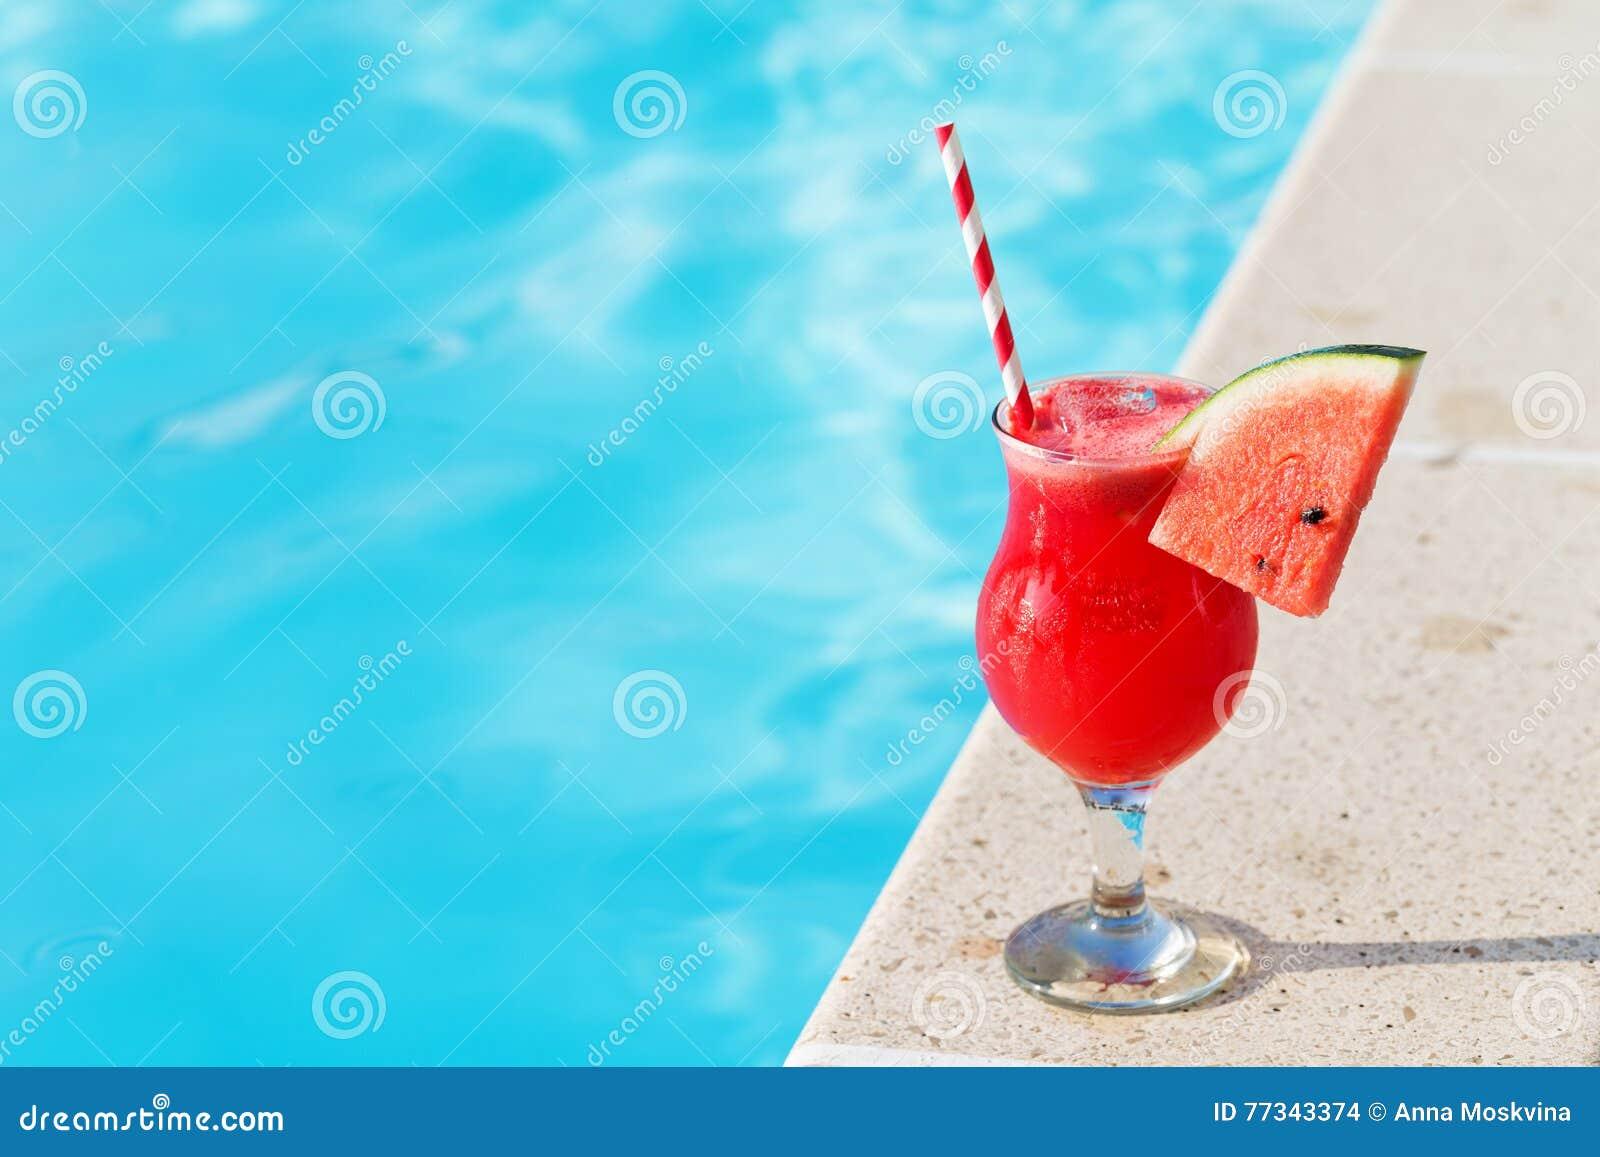 Fresh Drink Lemonade Orange Strawberry Cranberries Royalty